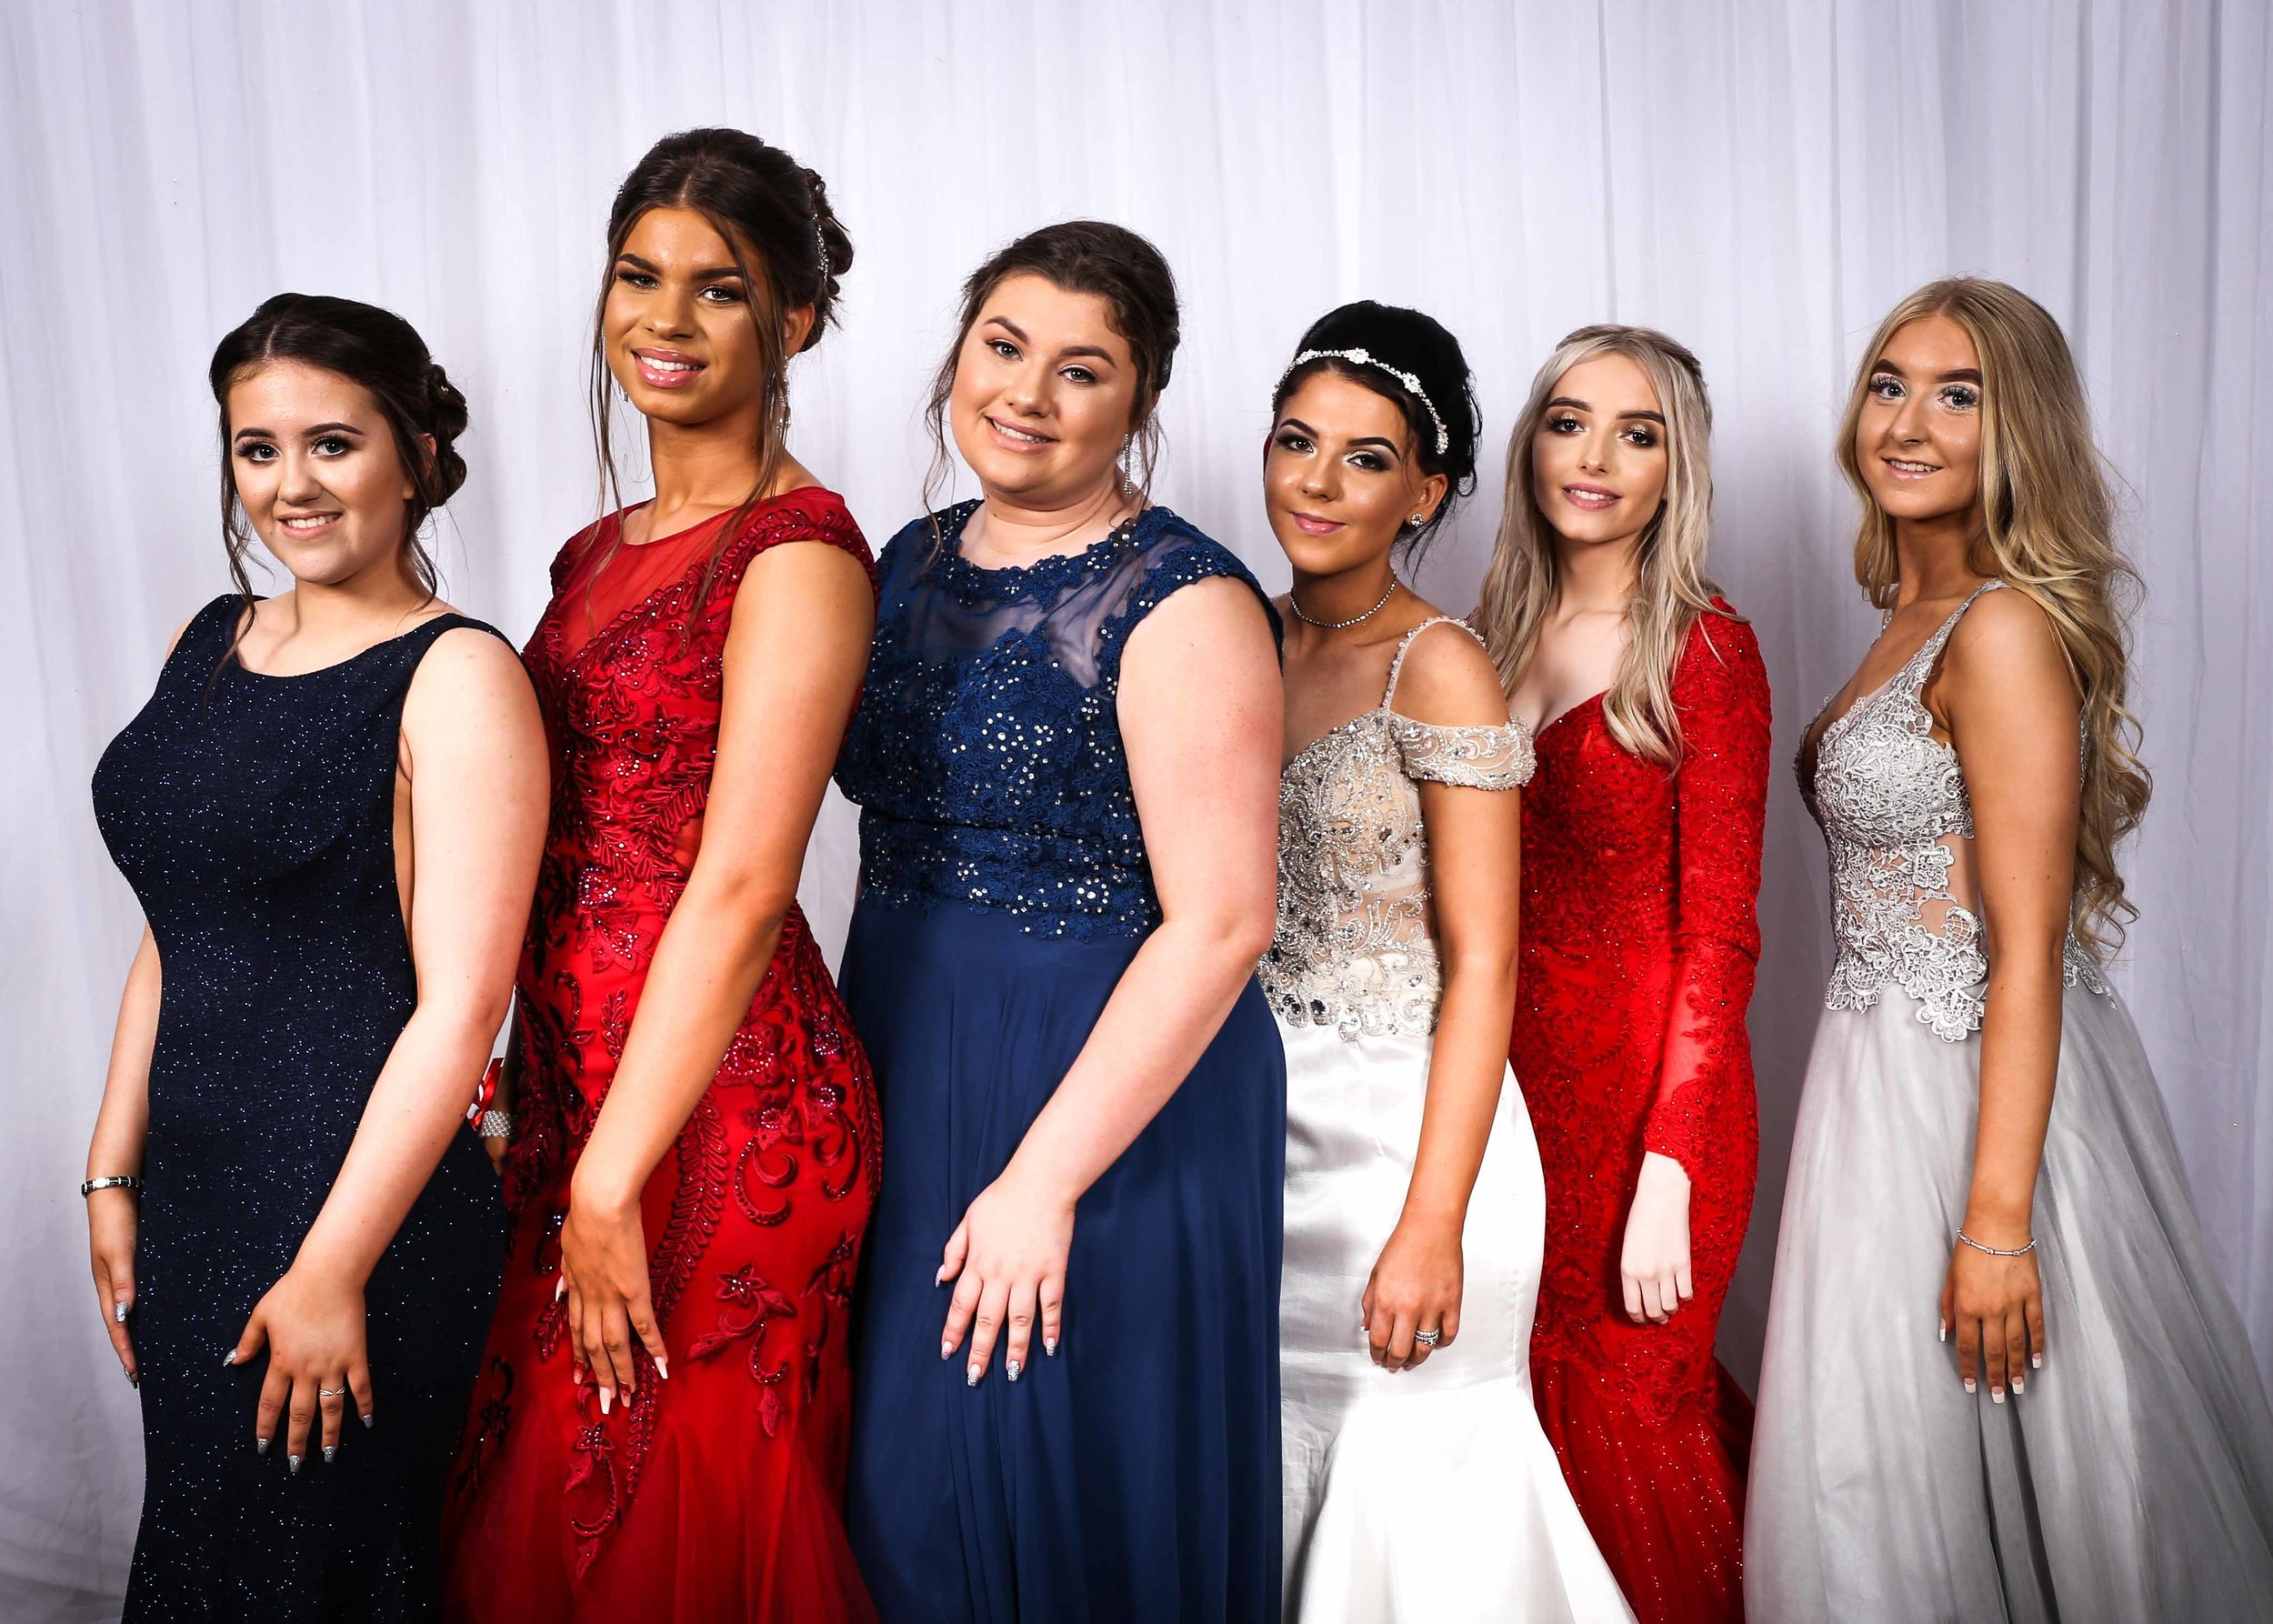 Jess Jones, Leah Caunt, Sadie Thompson, Summer Burnham, Jade Rich, Molly Sigsworth.